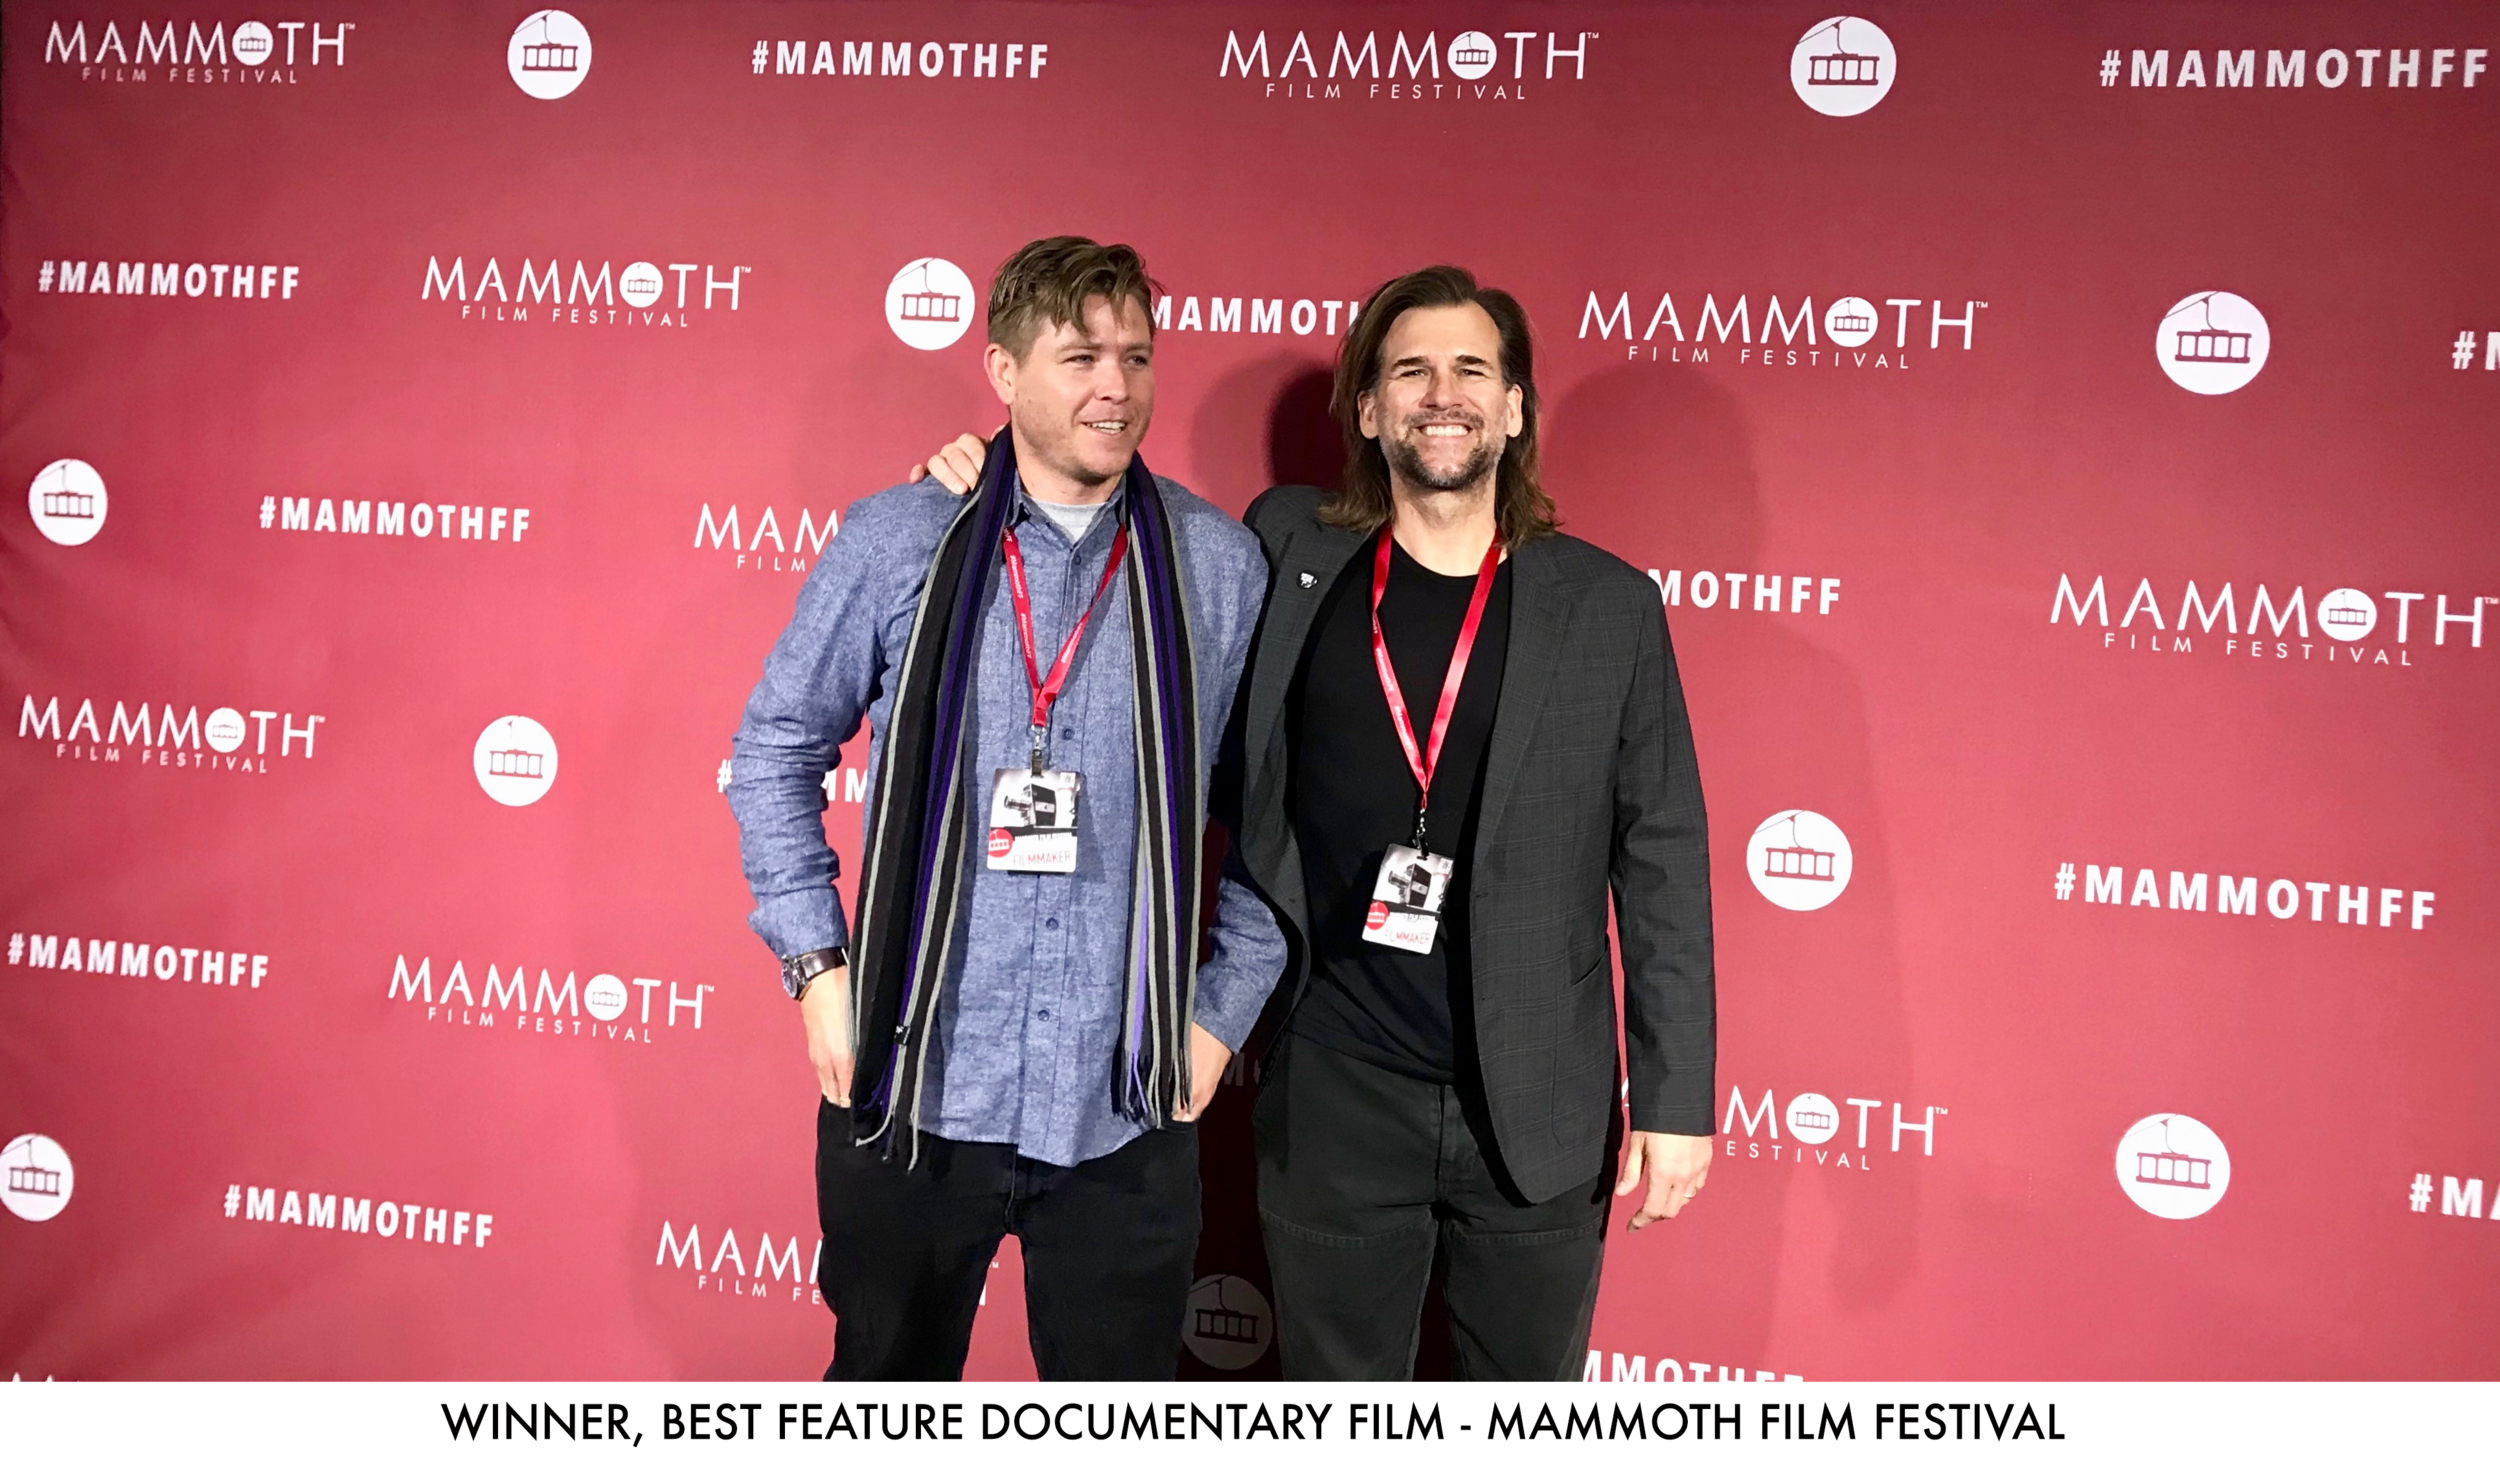 WINNER: BEST FEATURE DOCUMENTARY, 2019 MAMMOTH FILM FESTIVAL